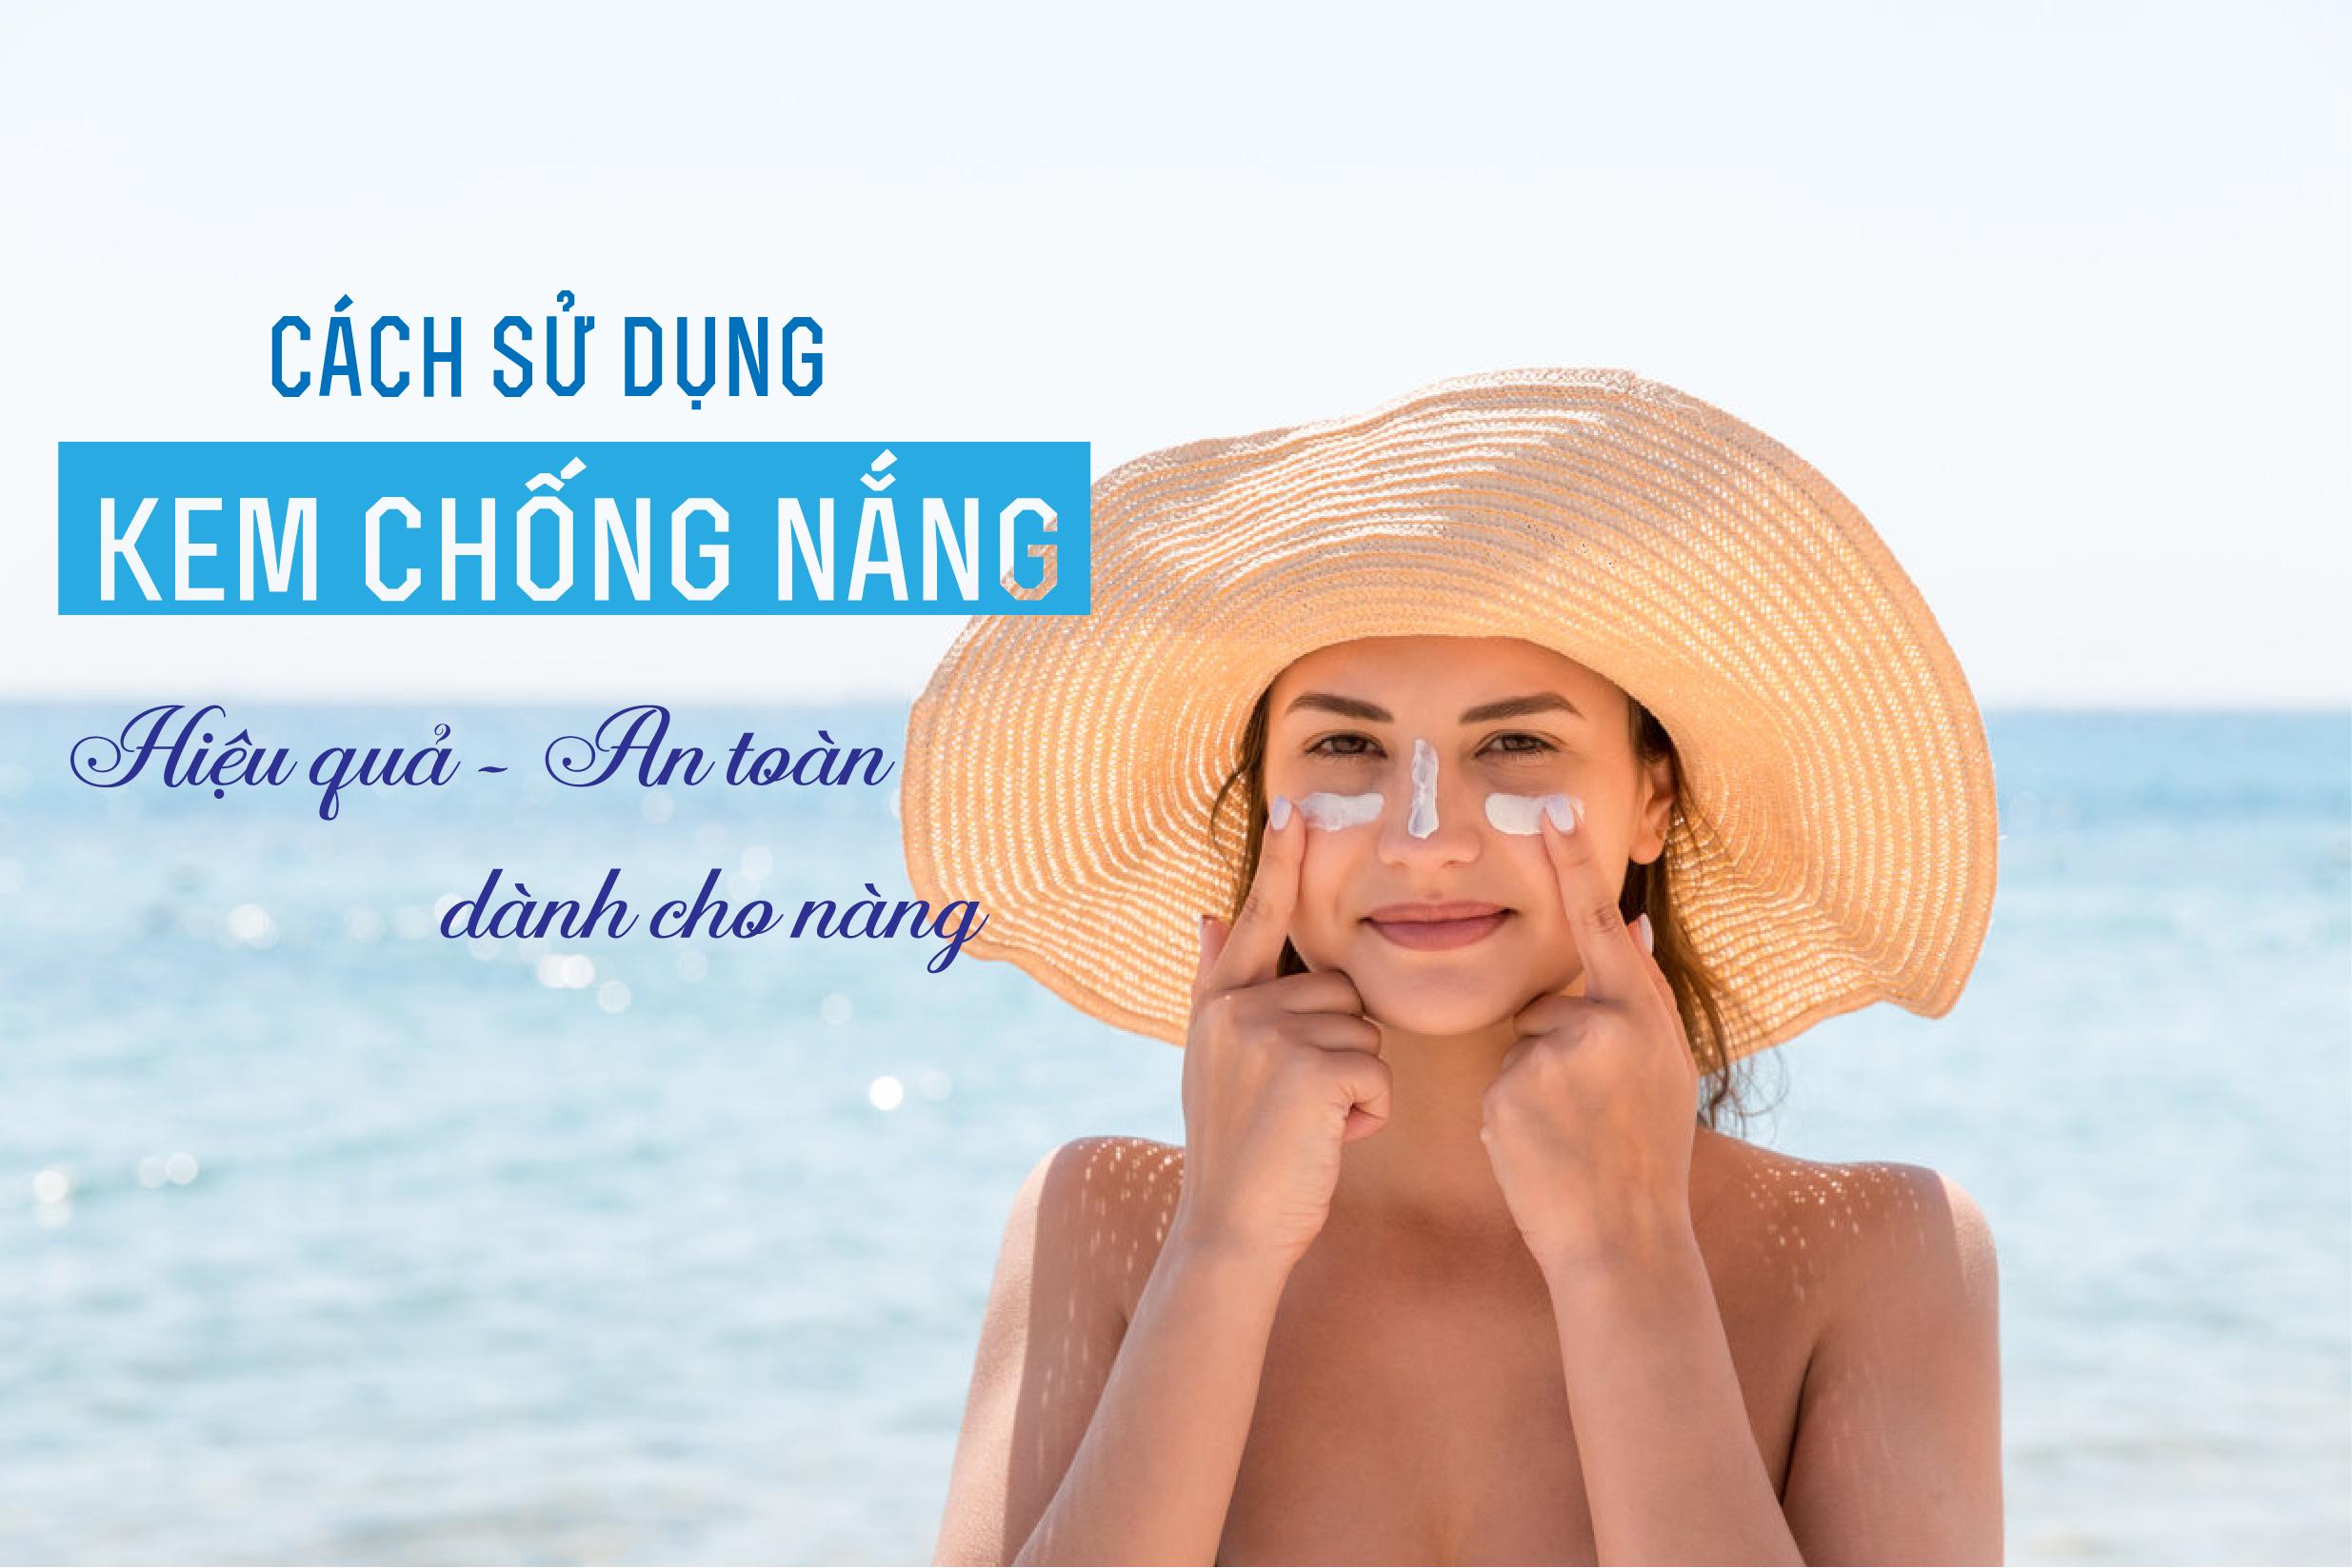 cach-su-dung-kem-chong-nang-hieu-qua (1)